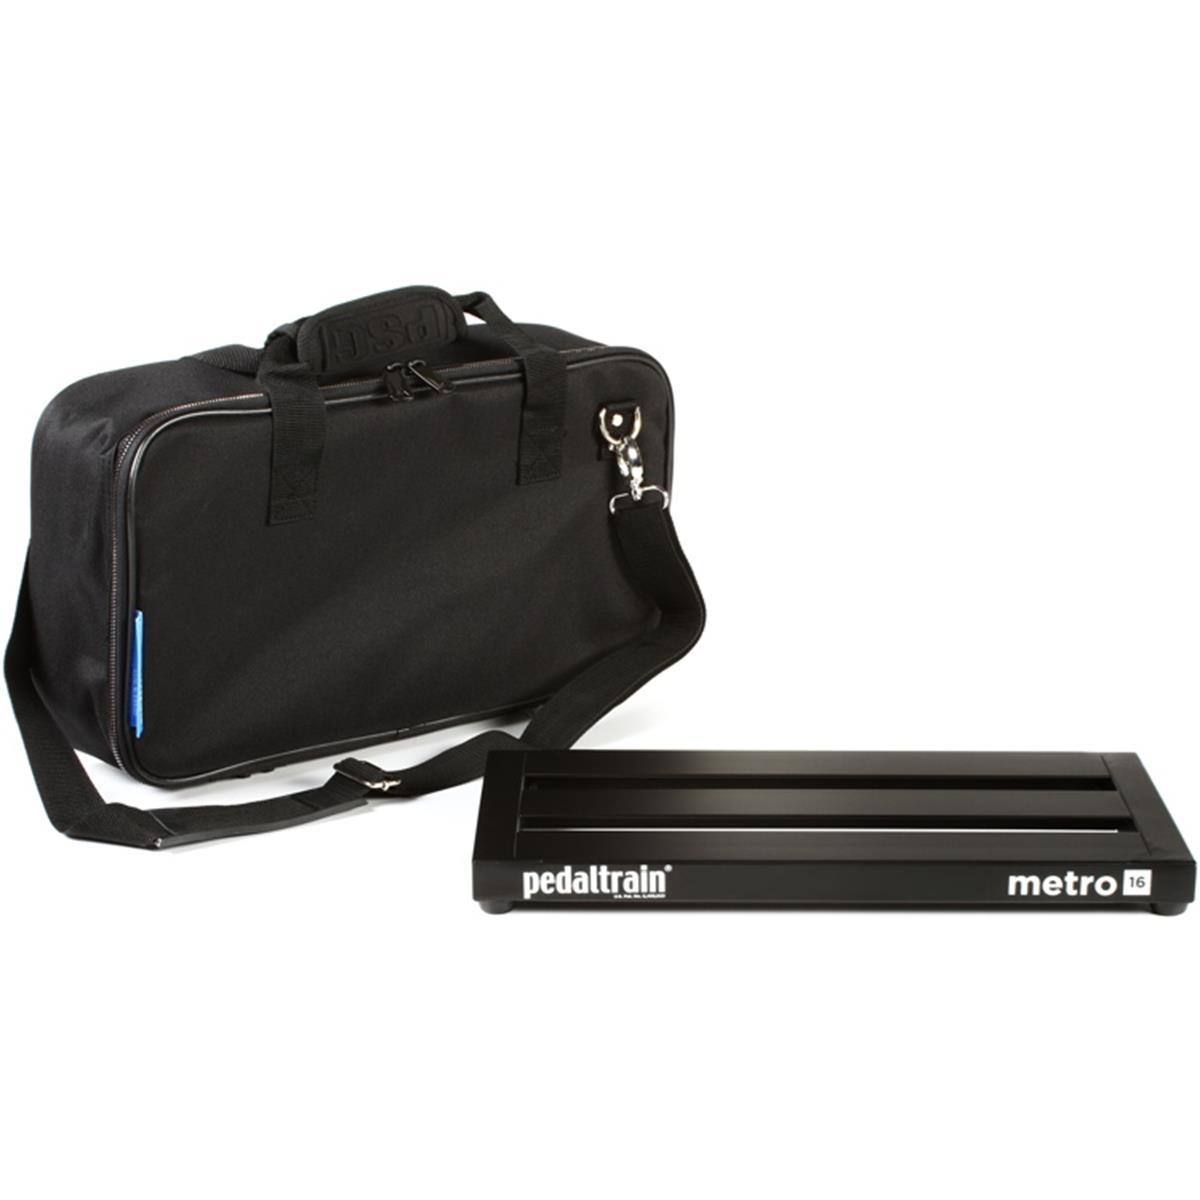 PEDALTRAIN-METRO-16-SOFT-CASE-PEDALBOARD-pedal-board-sku-13876